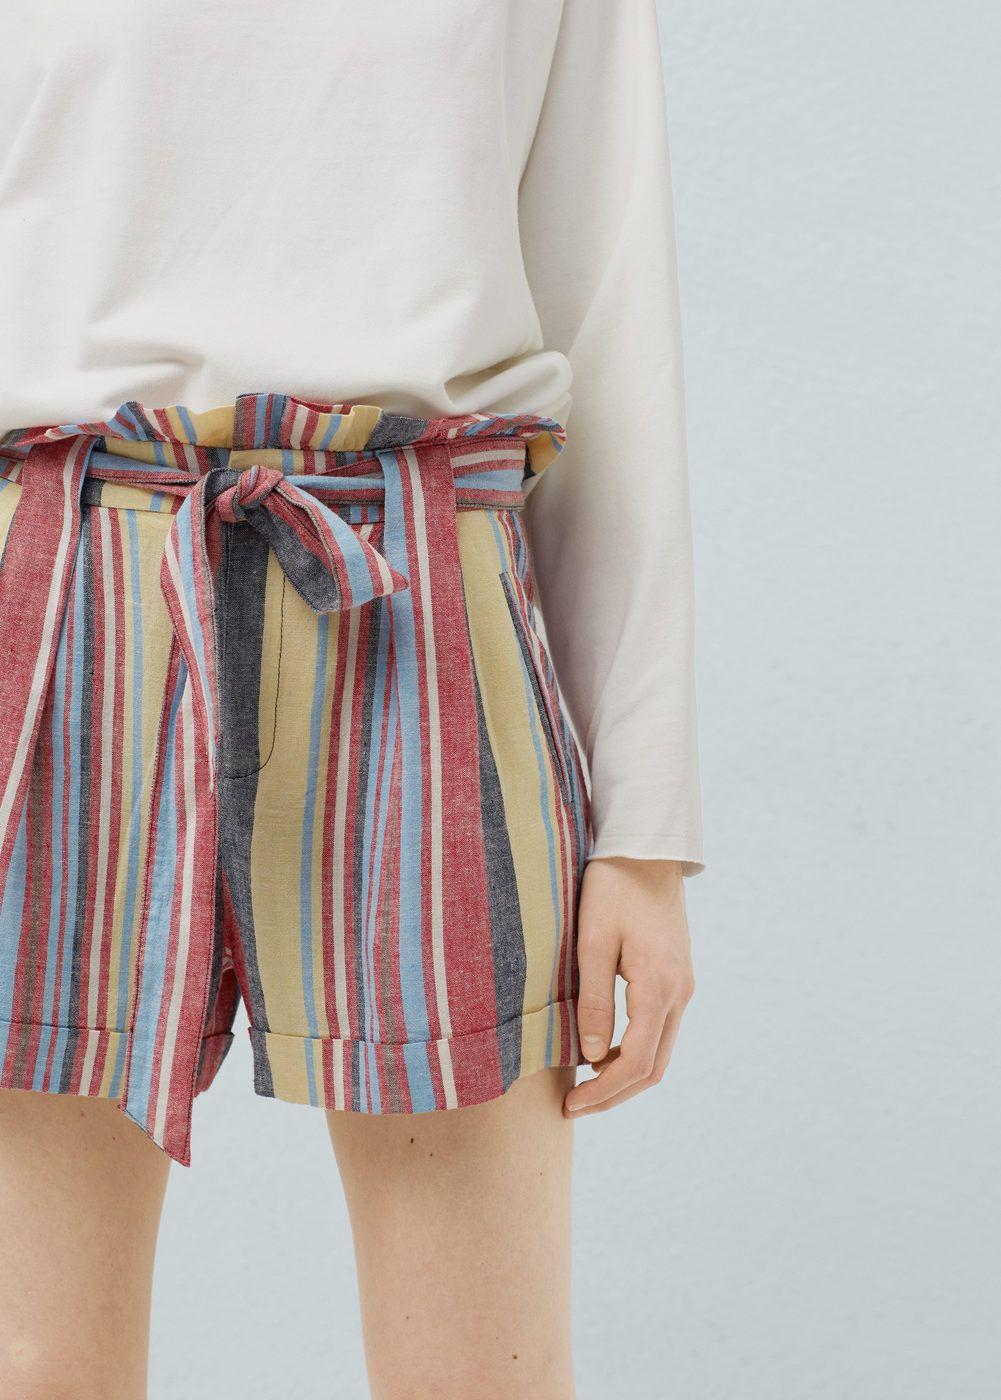 Seitenansicht...Hose - Anleitung mit Schnittmuster | Mode | Pinterest